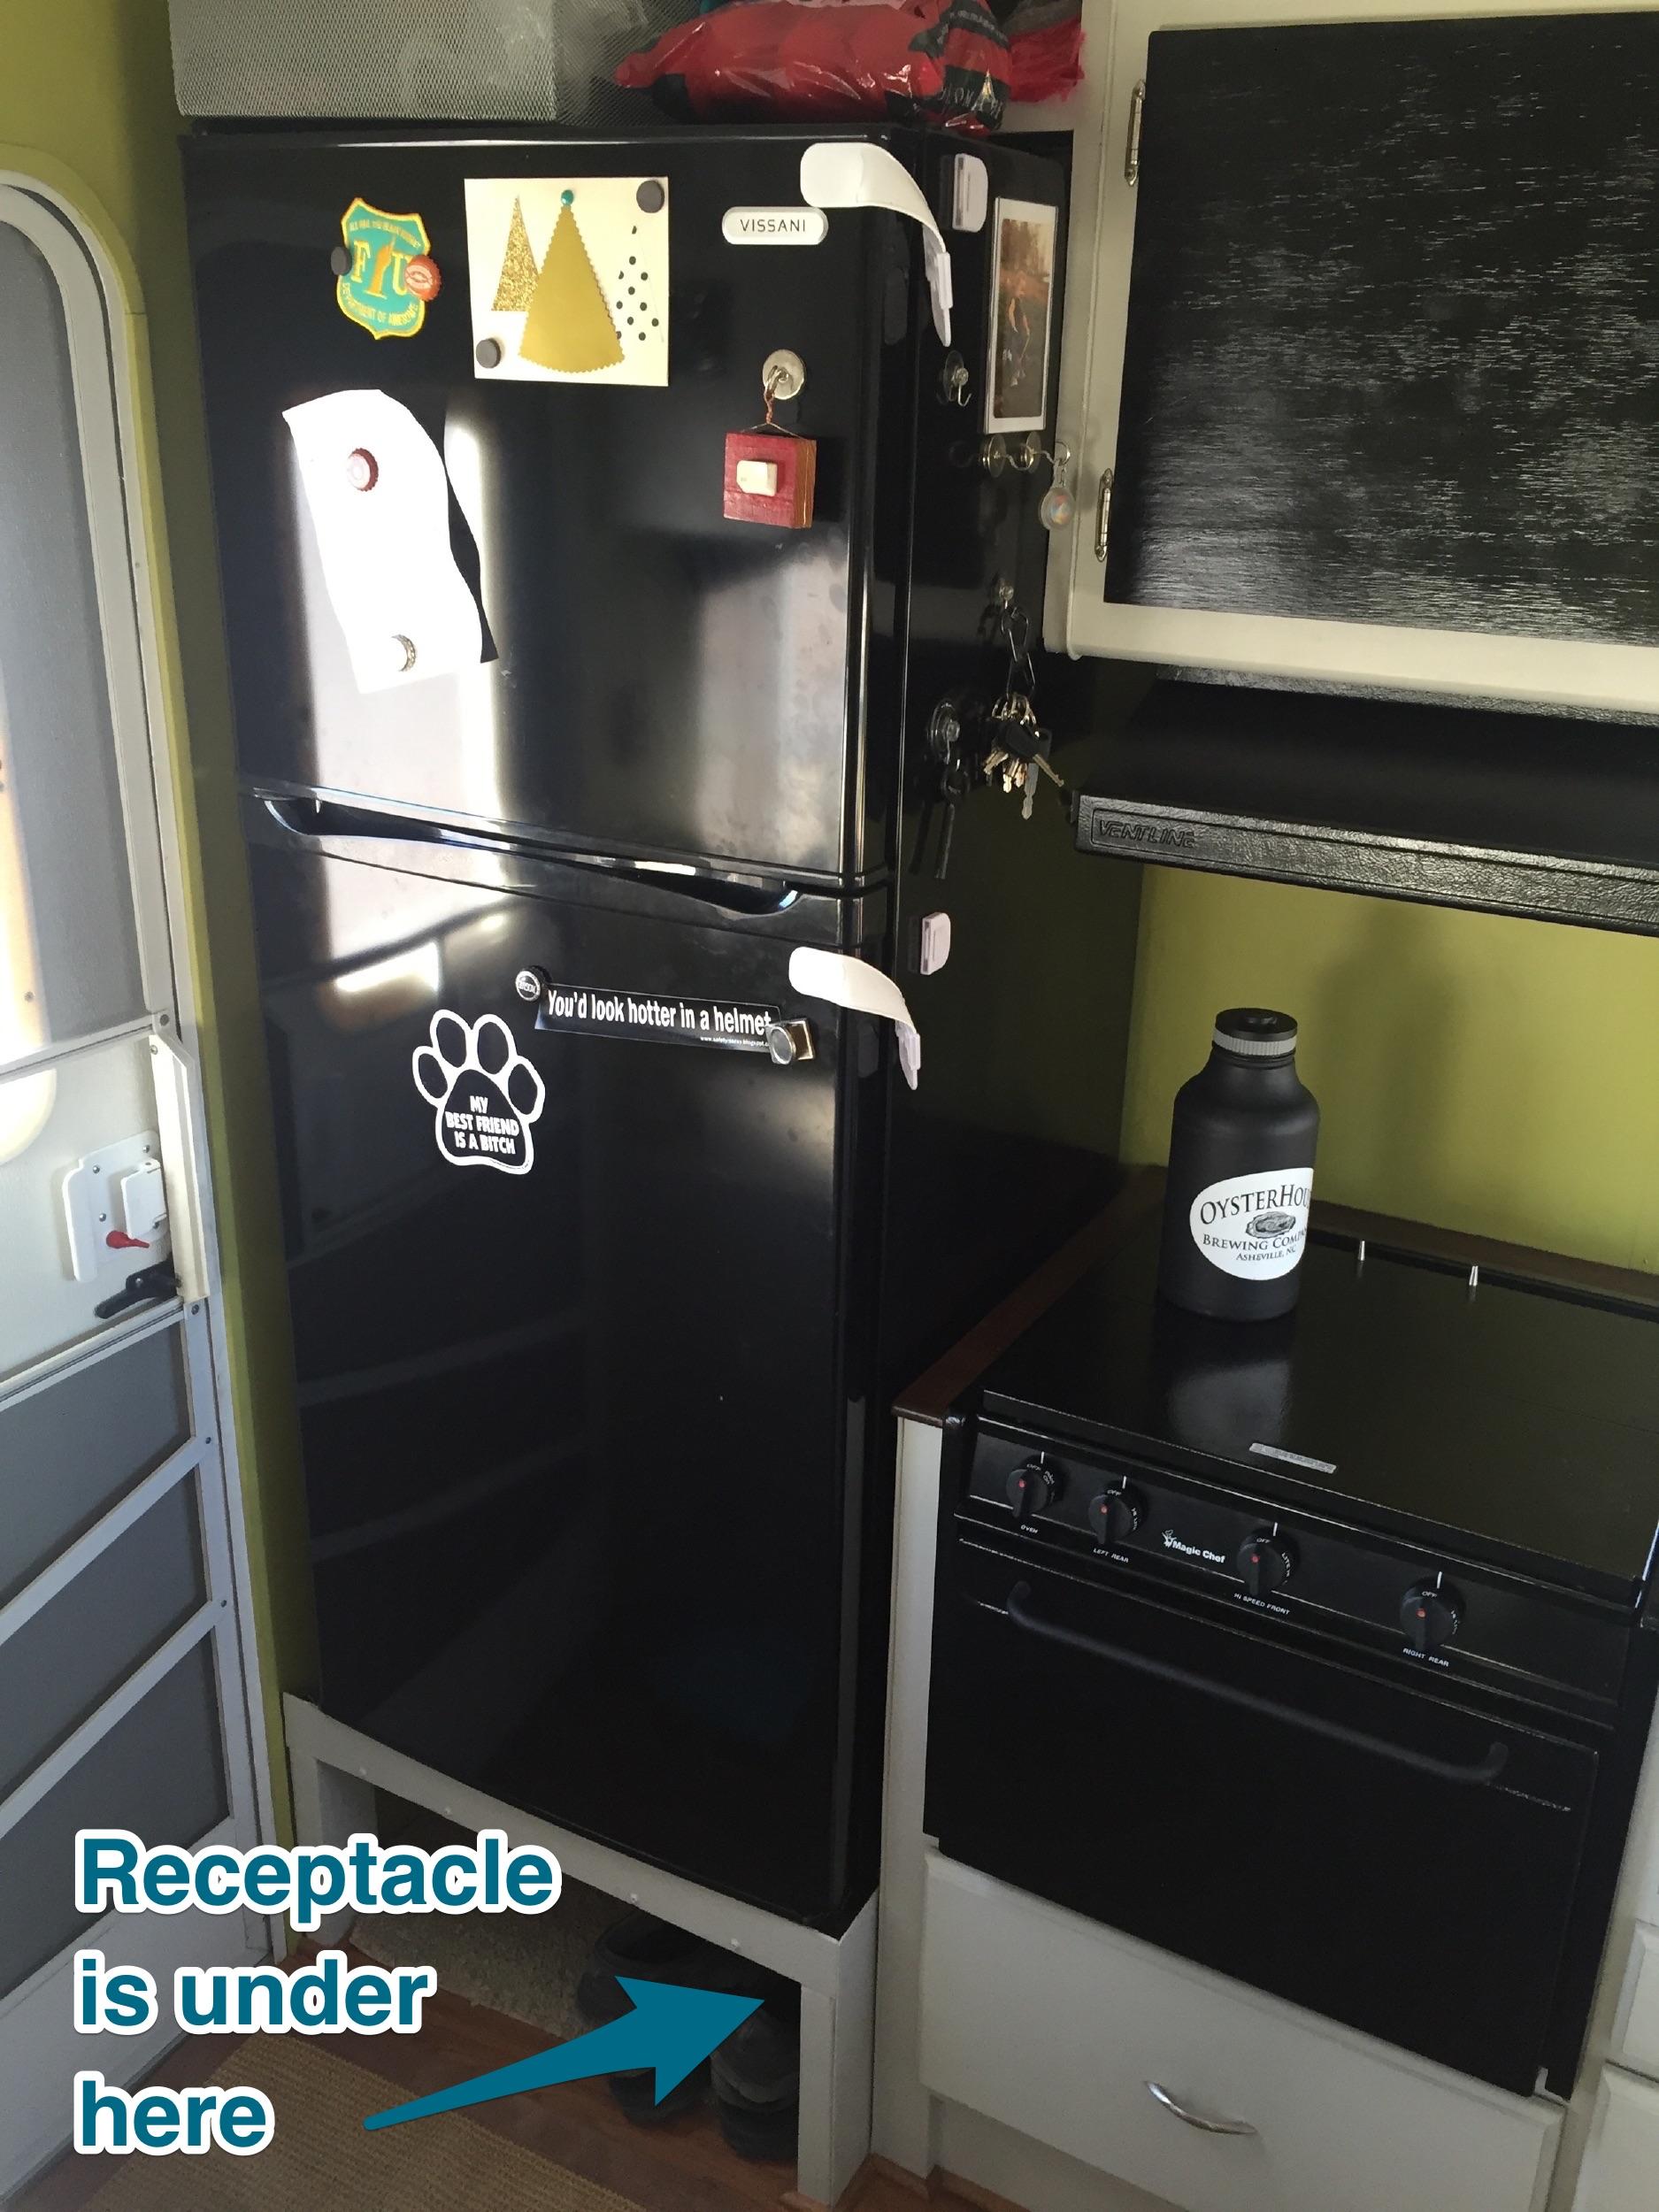 Regular apartment-style fridge